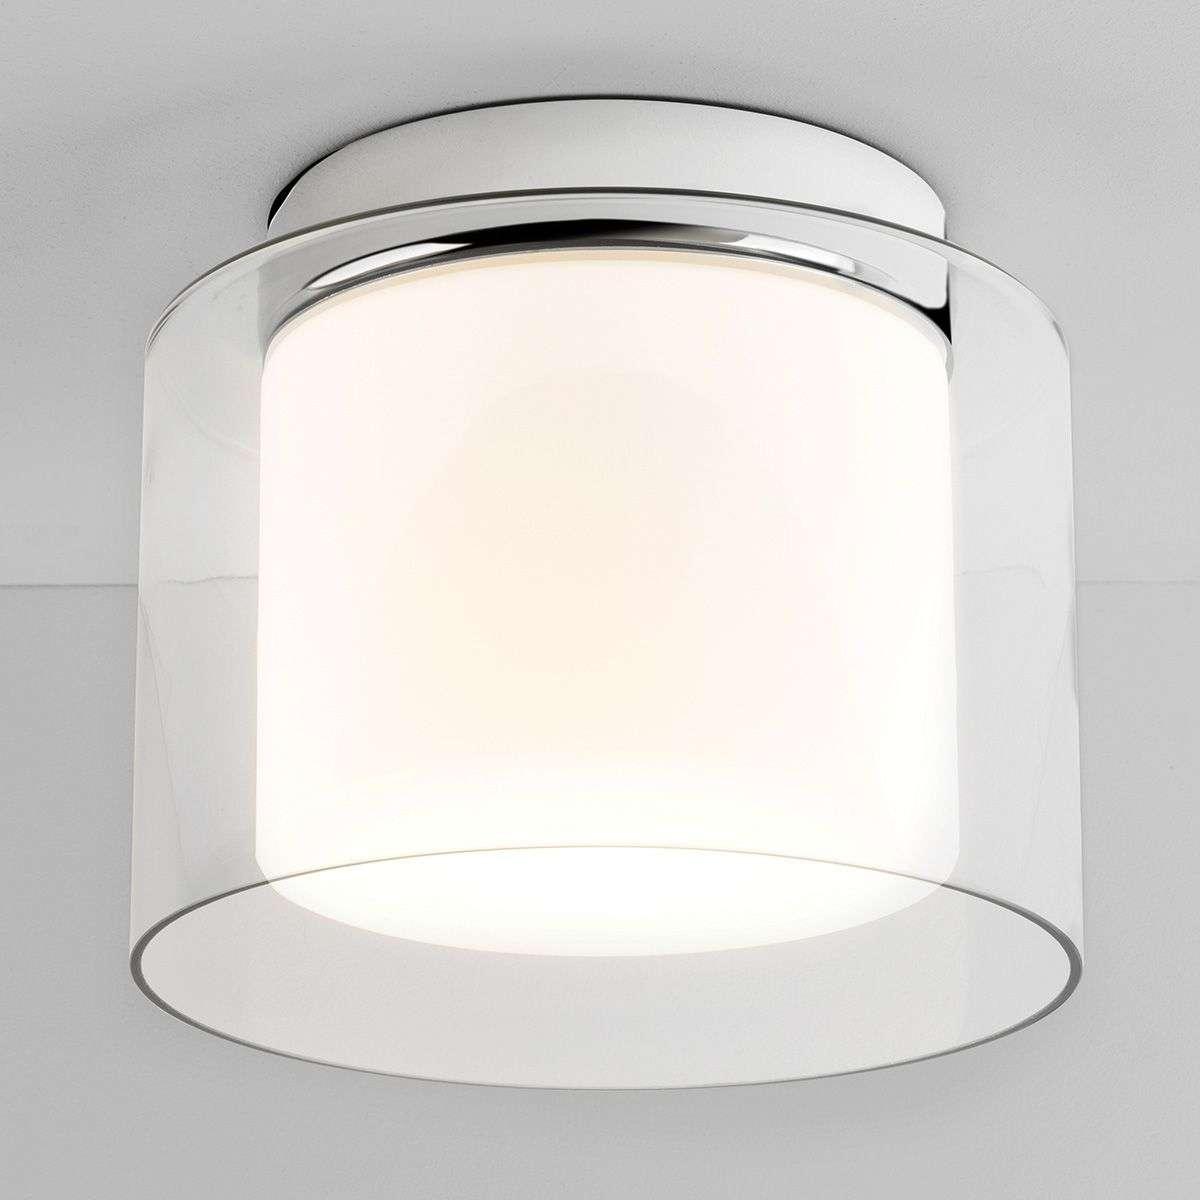 Double glazed ceiling light AREZZO-1020391-32